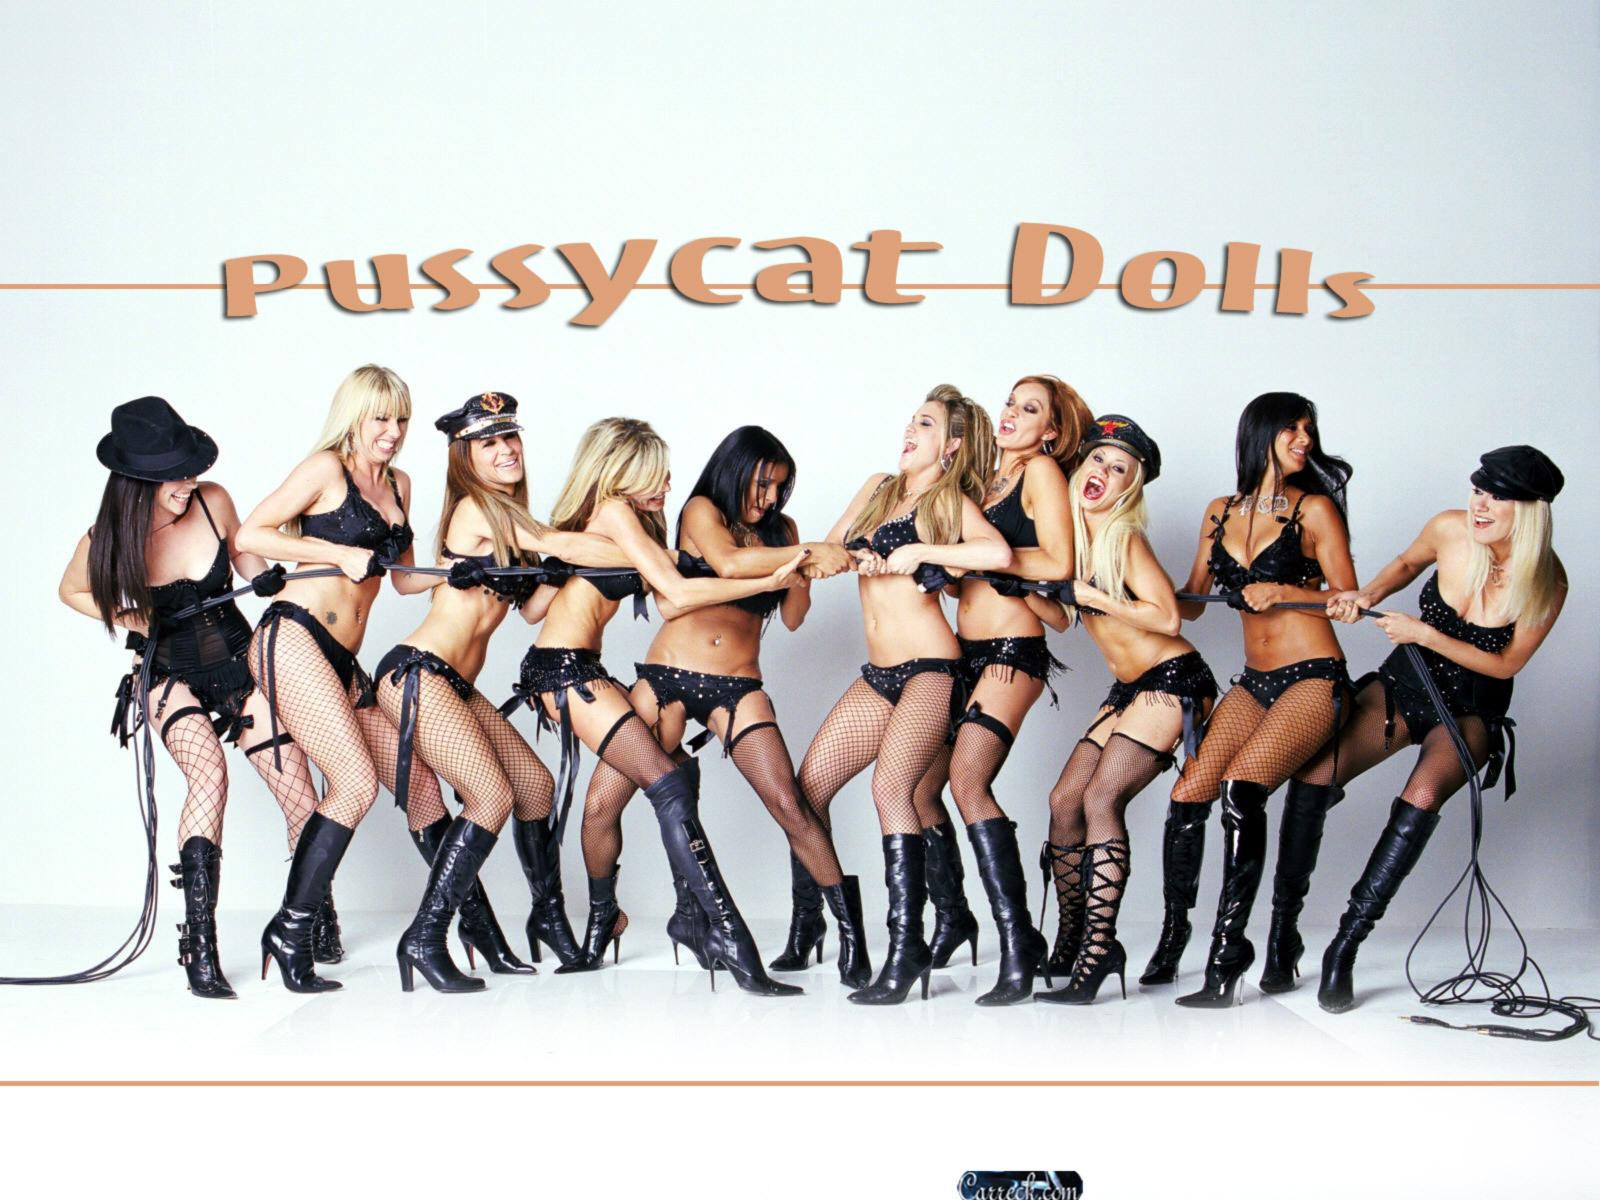 Pussy cat dolls dvd